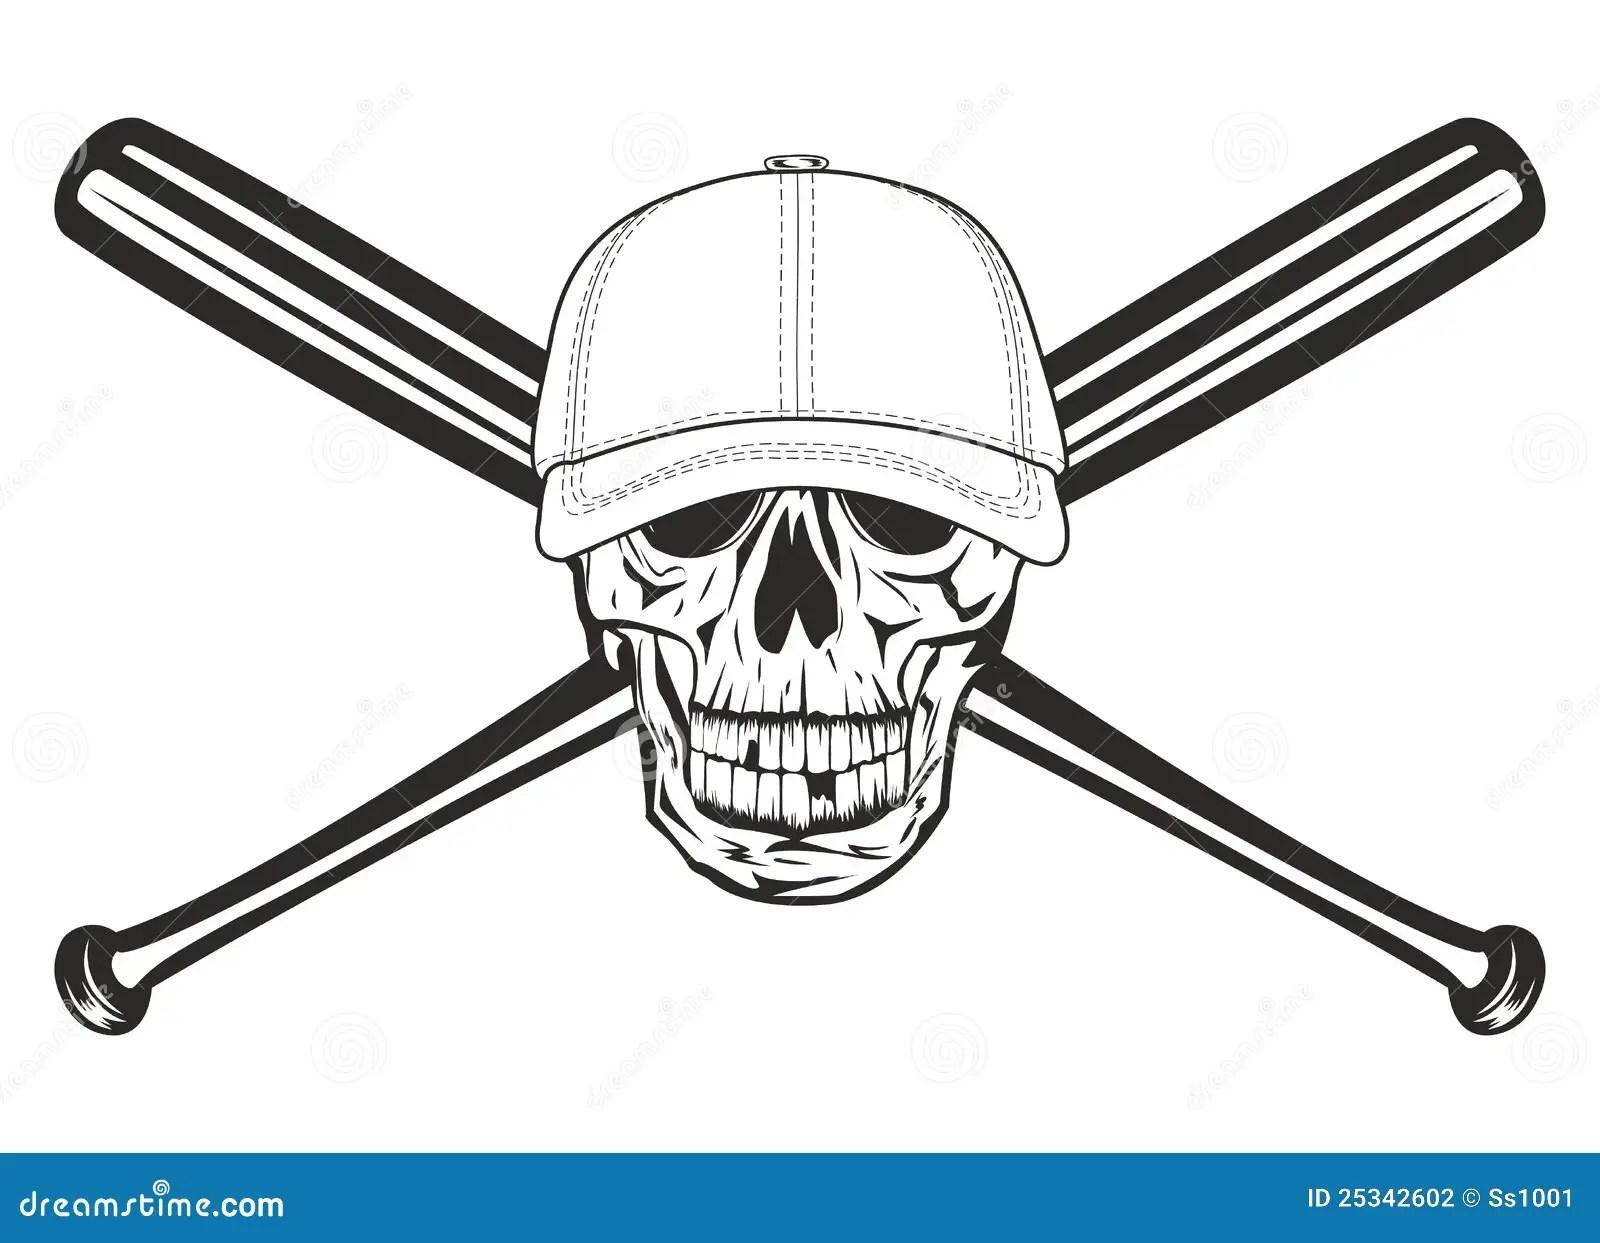 Skull And Crossed Bats Stock Vector Illustration Of